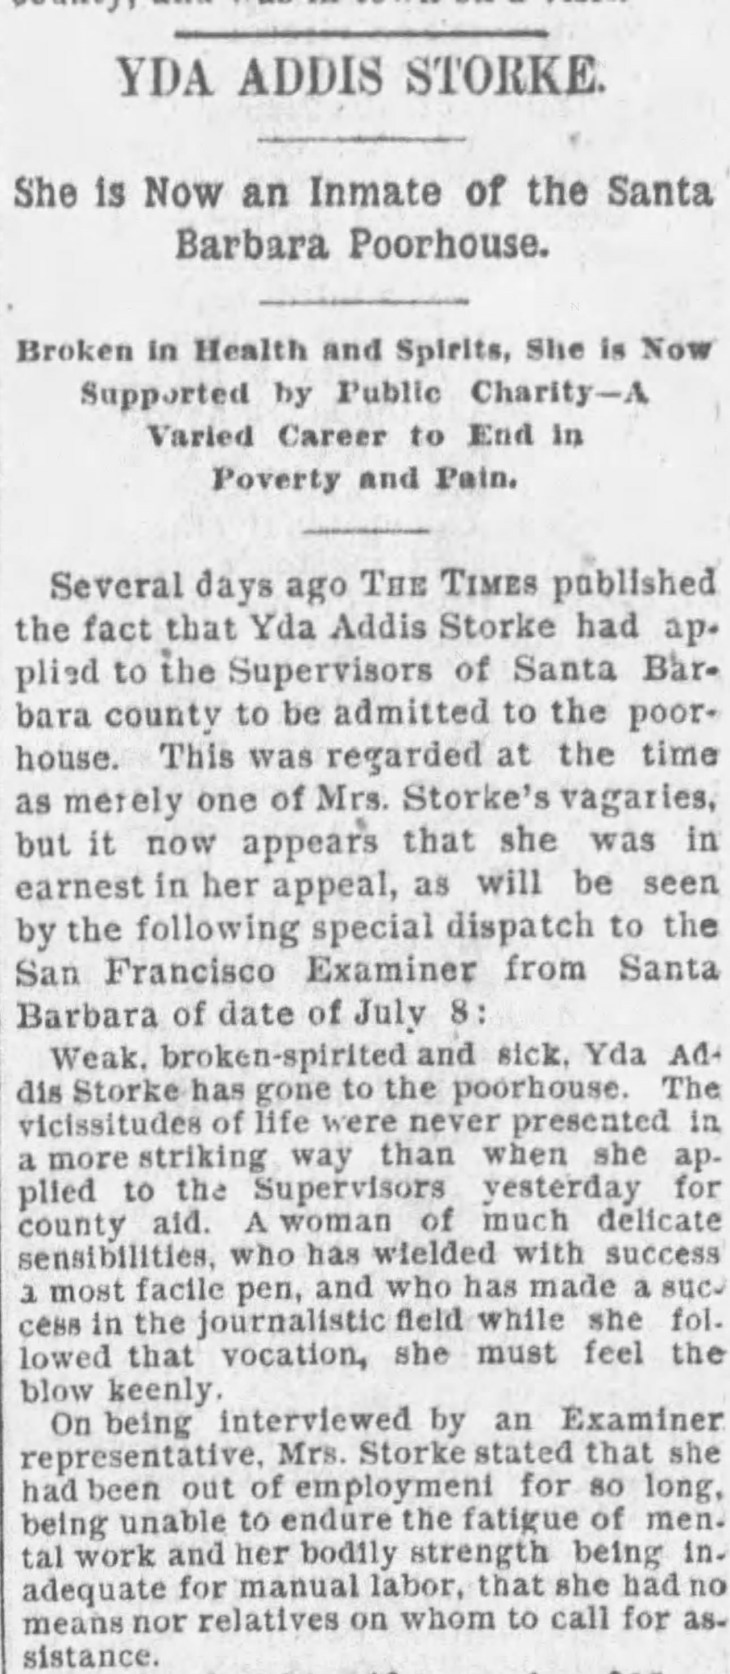 Yda poorhouse Gasterfield detail 1 The_Los_Angeles_Times_Mon__Jul_11__1892_